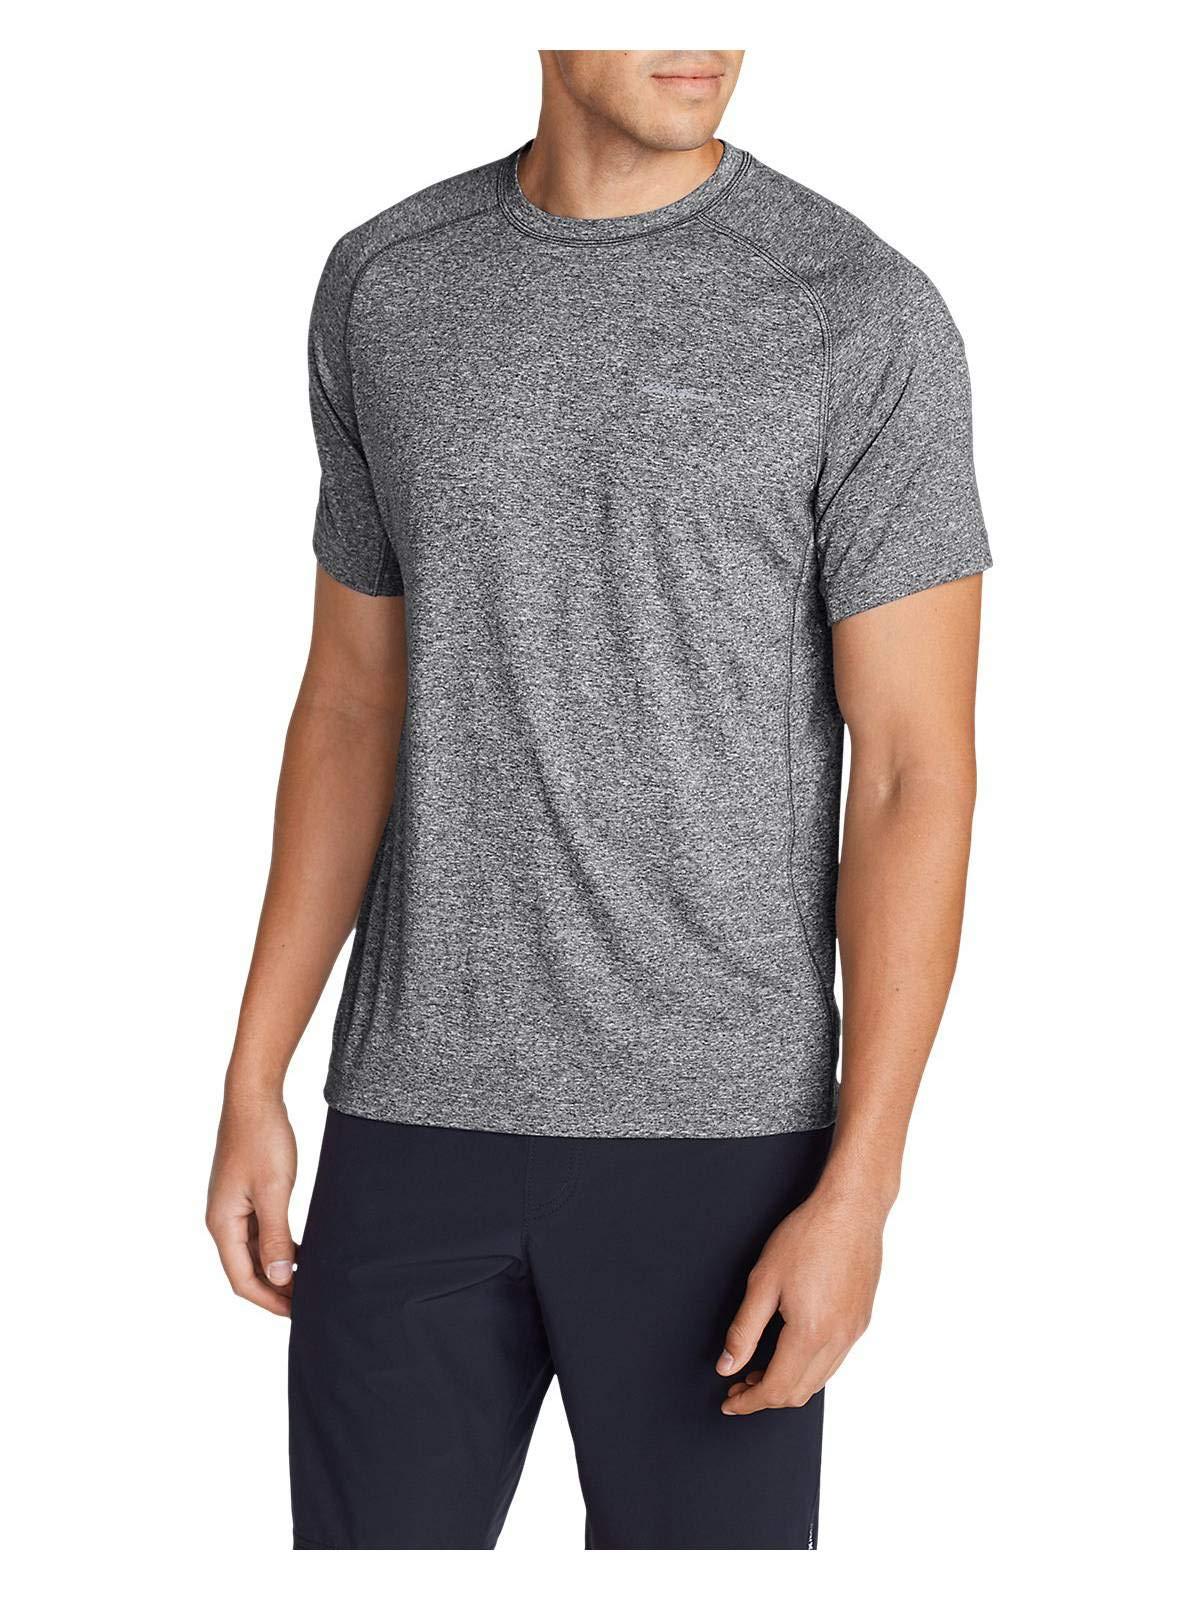 Eddie Bauer Men's Resolution Short-Sleeve T-Shirt, HTR Gray Regular S